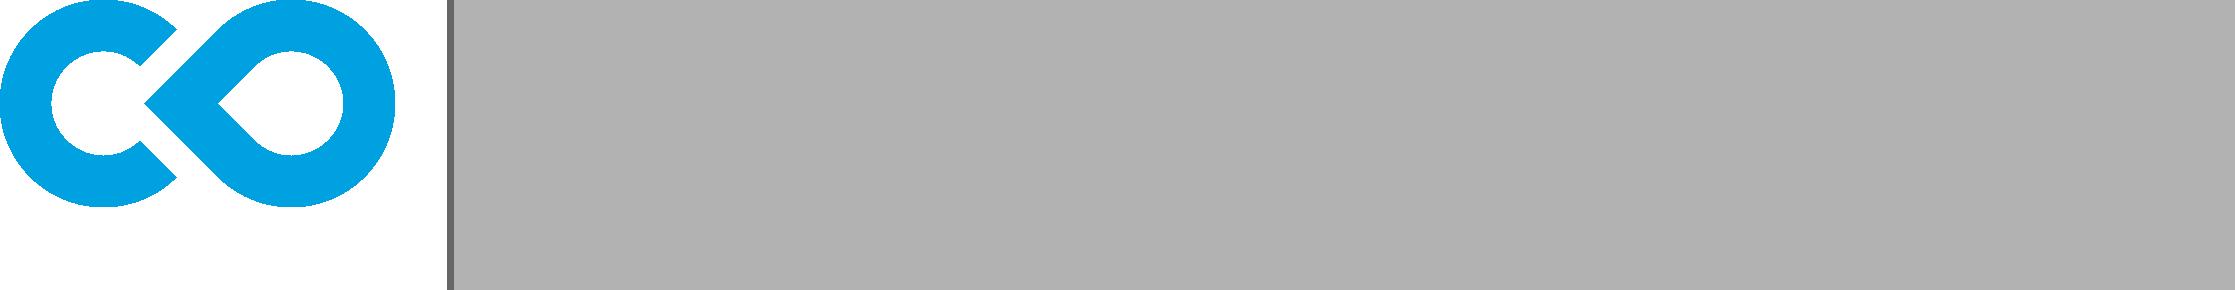 code-ocean-logo